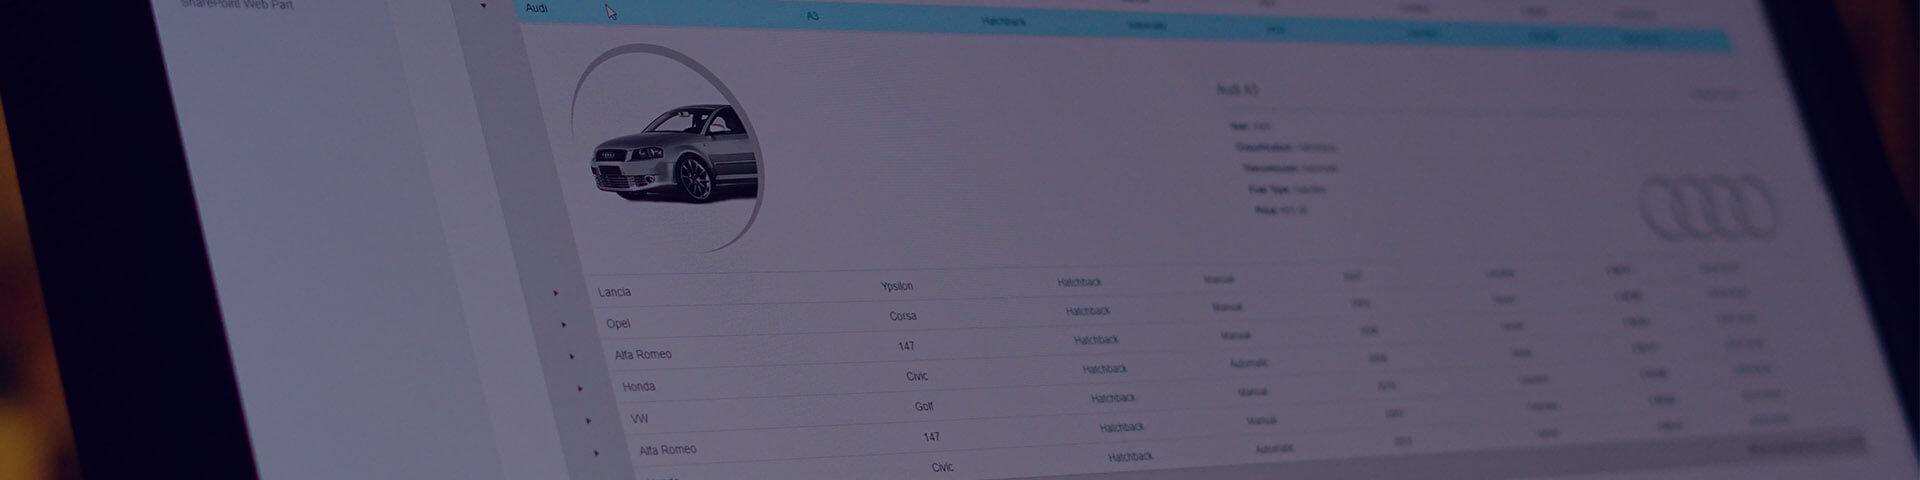 Grid Control - Telerik UI for ASP NET AJAX - Telerik